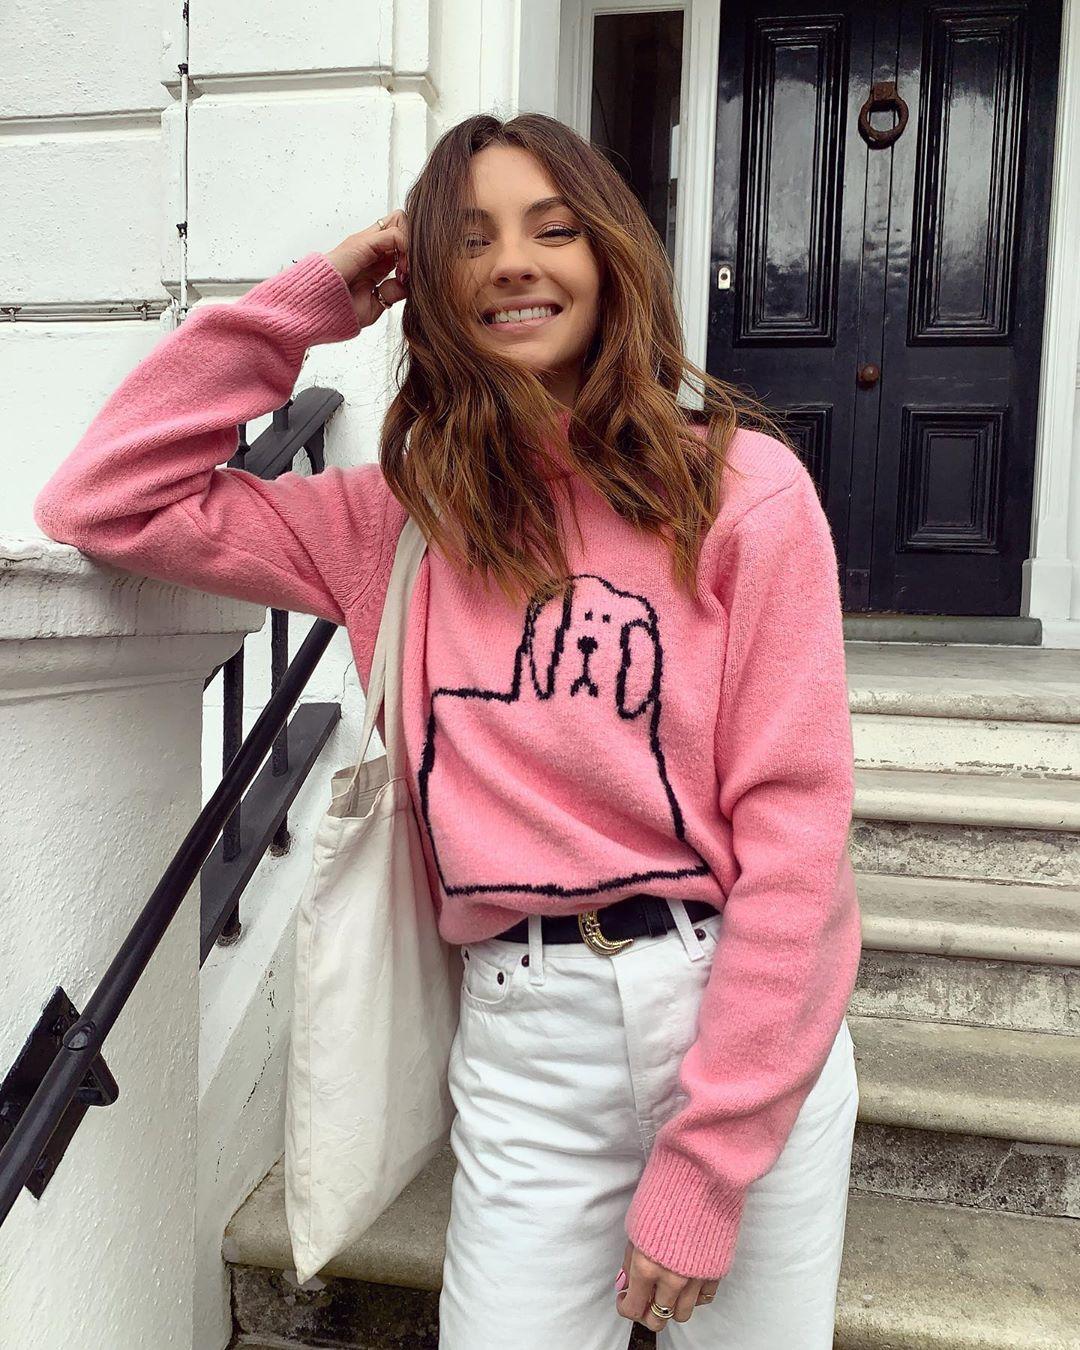 Chloe-Hayward-Wallpapers-Insta-Fit-Bio-1